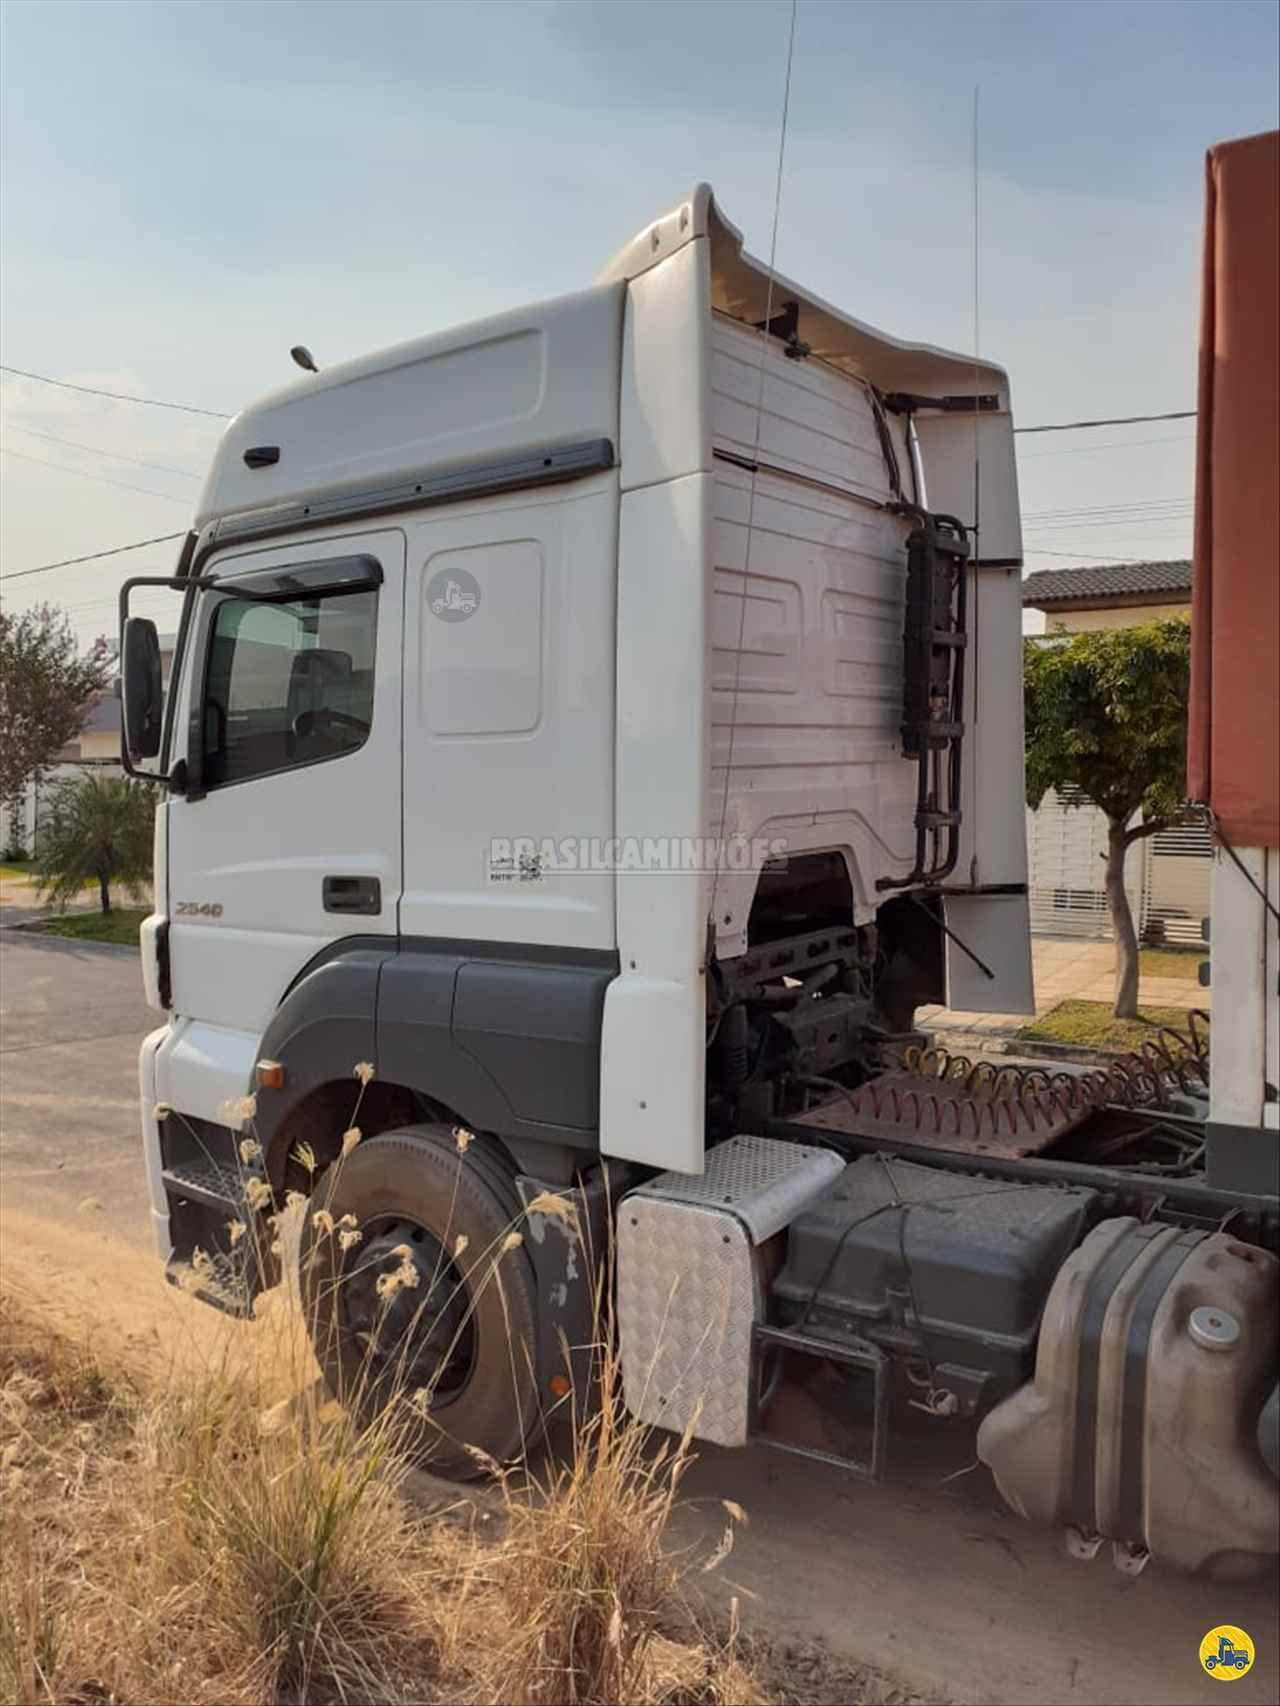 CAMINHAO MERCEDES-BENZ MB 2540 Graneleiro Truck 6x2 Brasil Caminhões Sinop SINOP MATO GROSSO MT